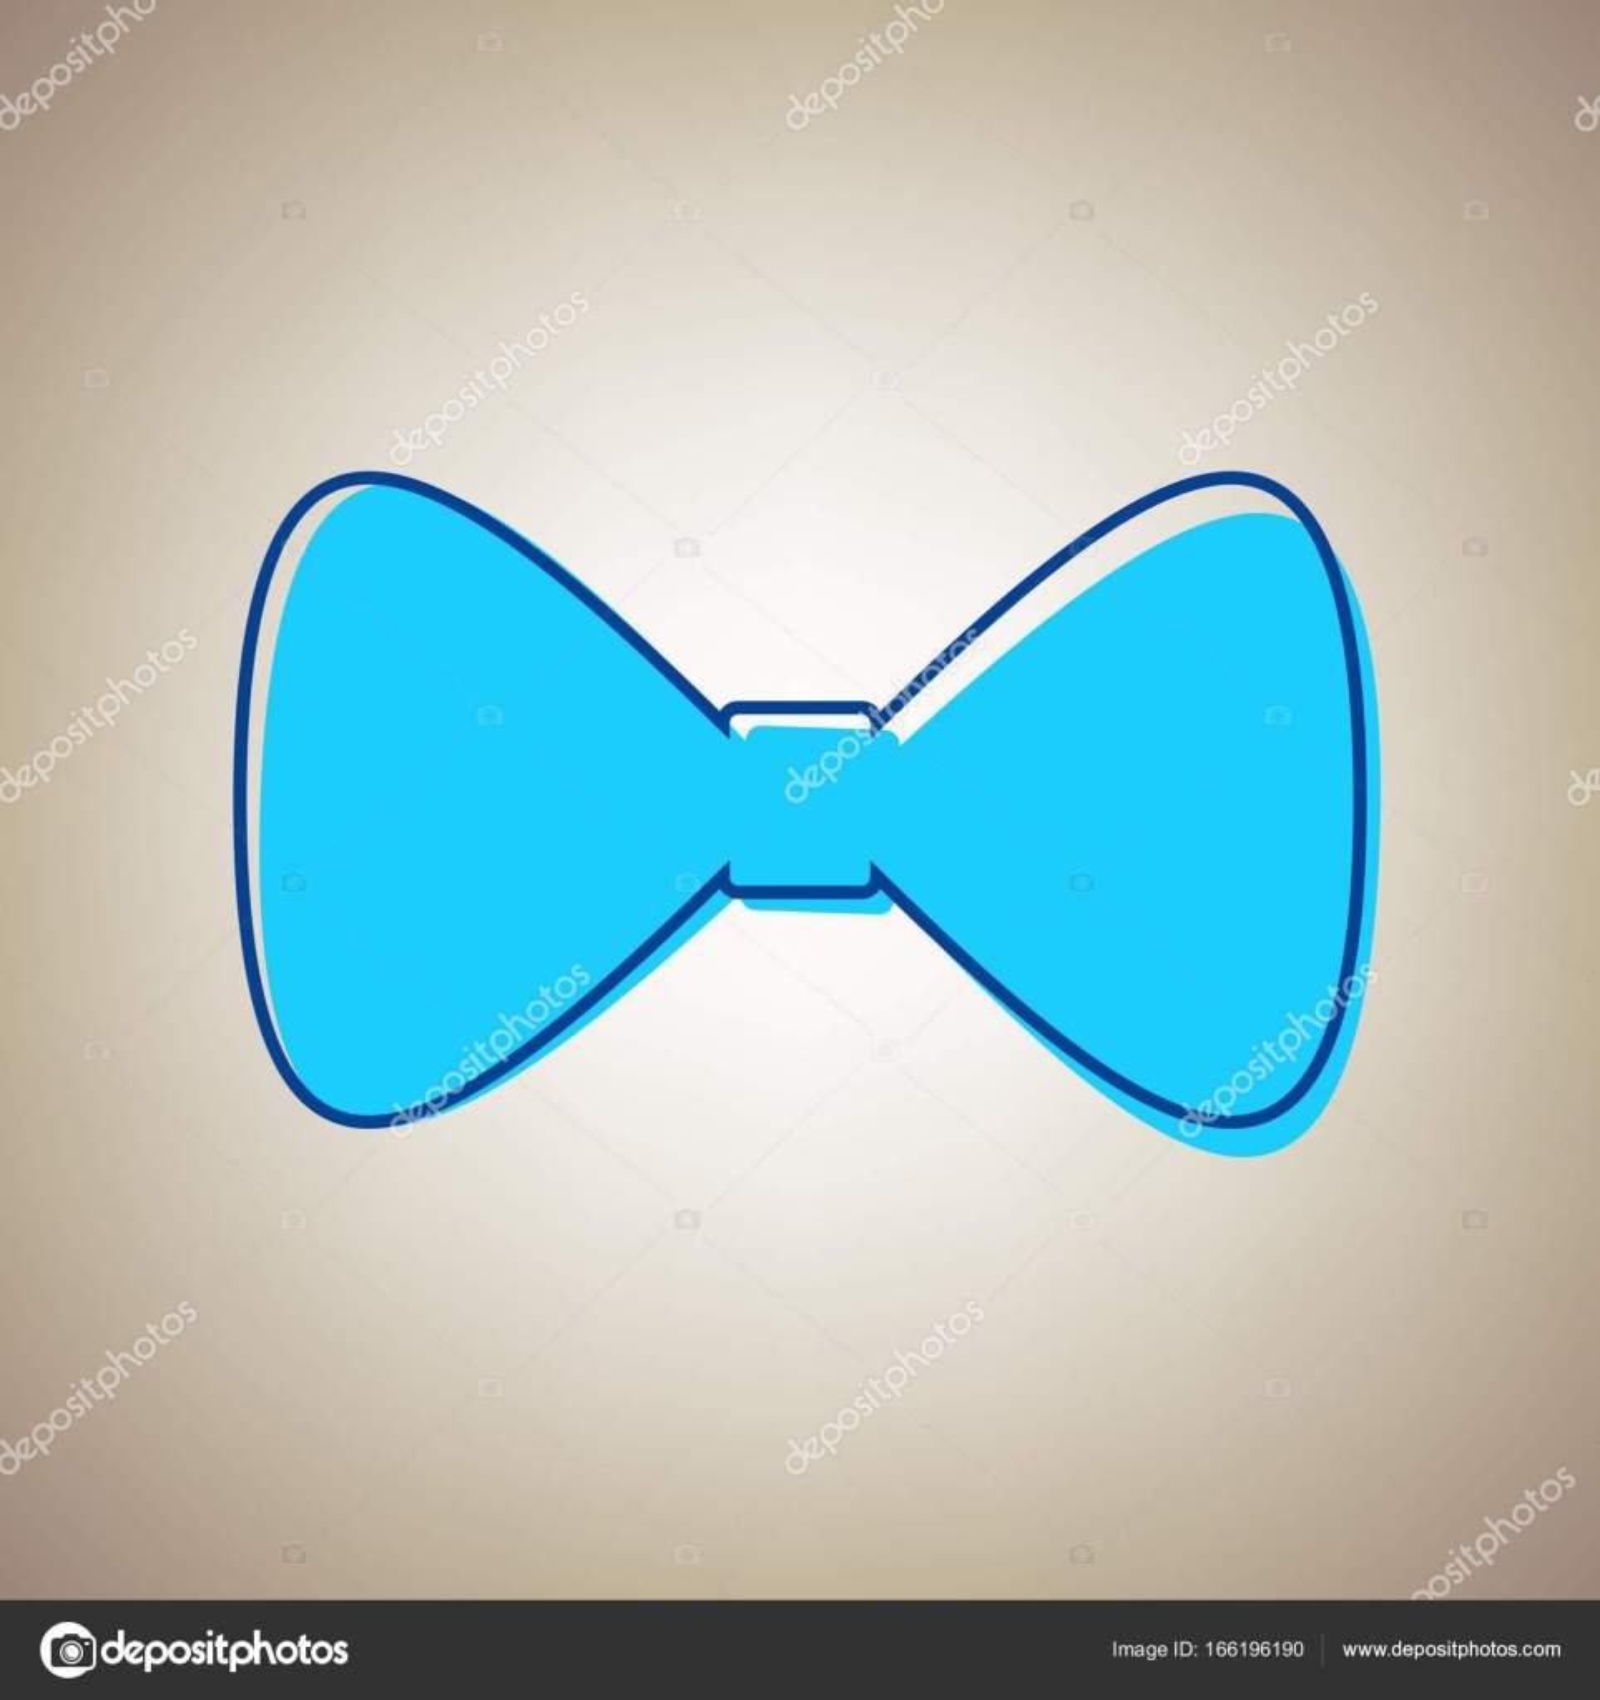 9fd8ac174 Símbolo de la pajarita. Vector. Icono azul cielo con contorno azul desertó  sobre fondo